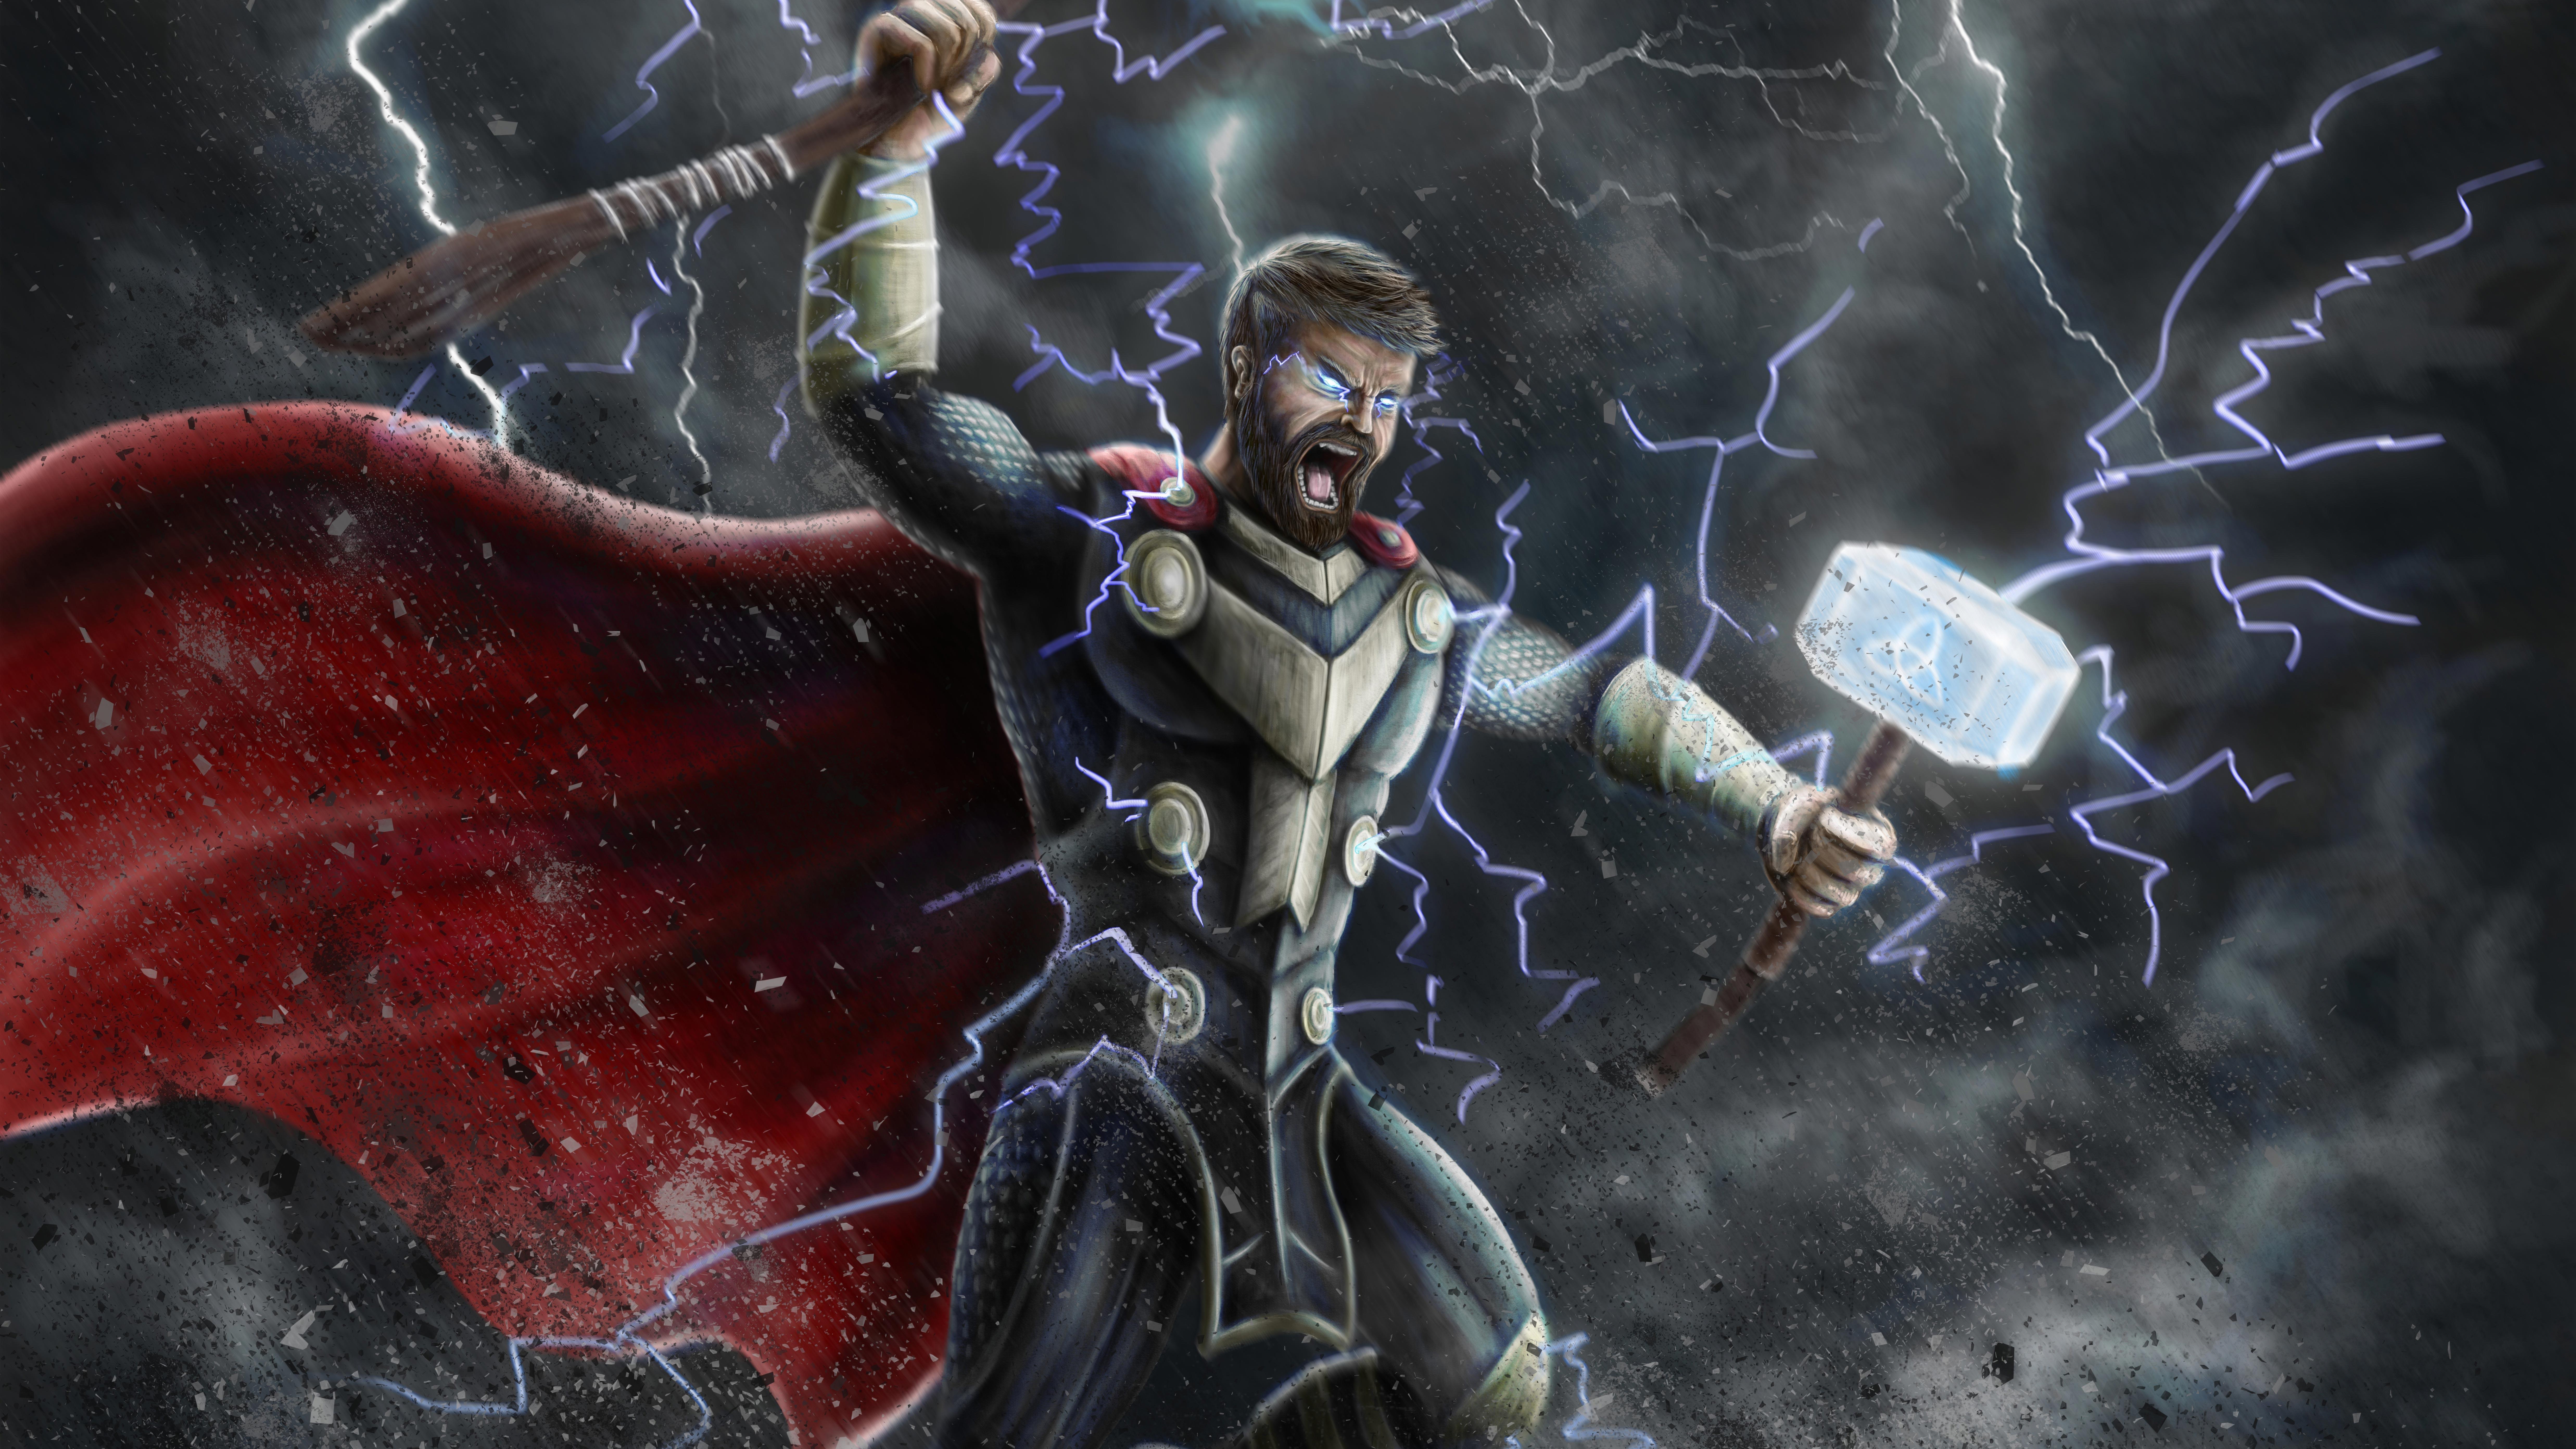 Thor MCU Artwork Wallpaper, HD Superheroes 4K Wallpapers ...